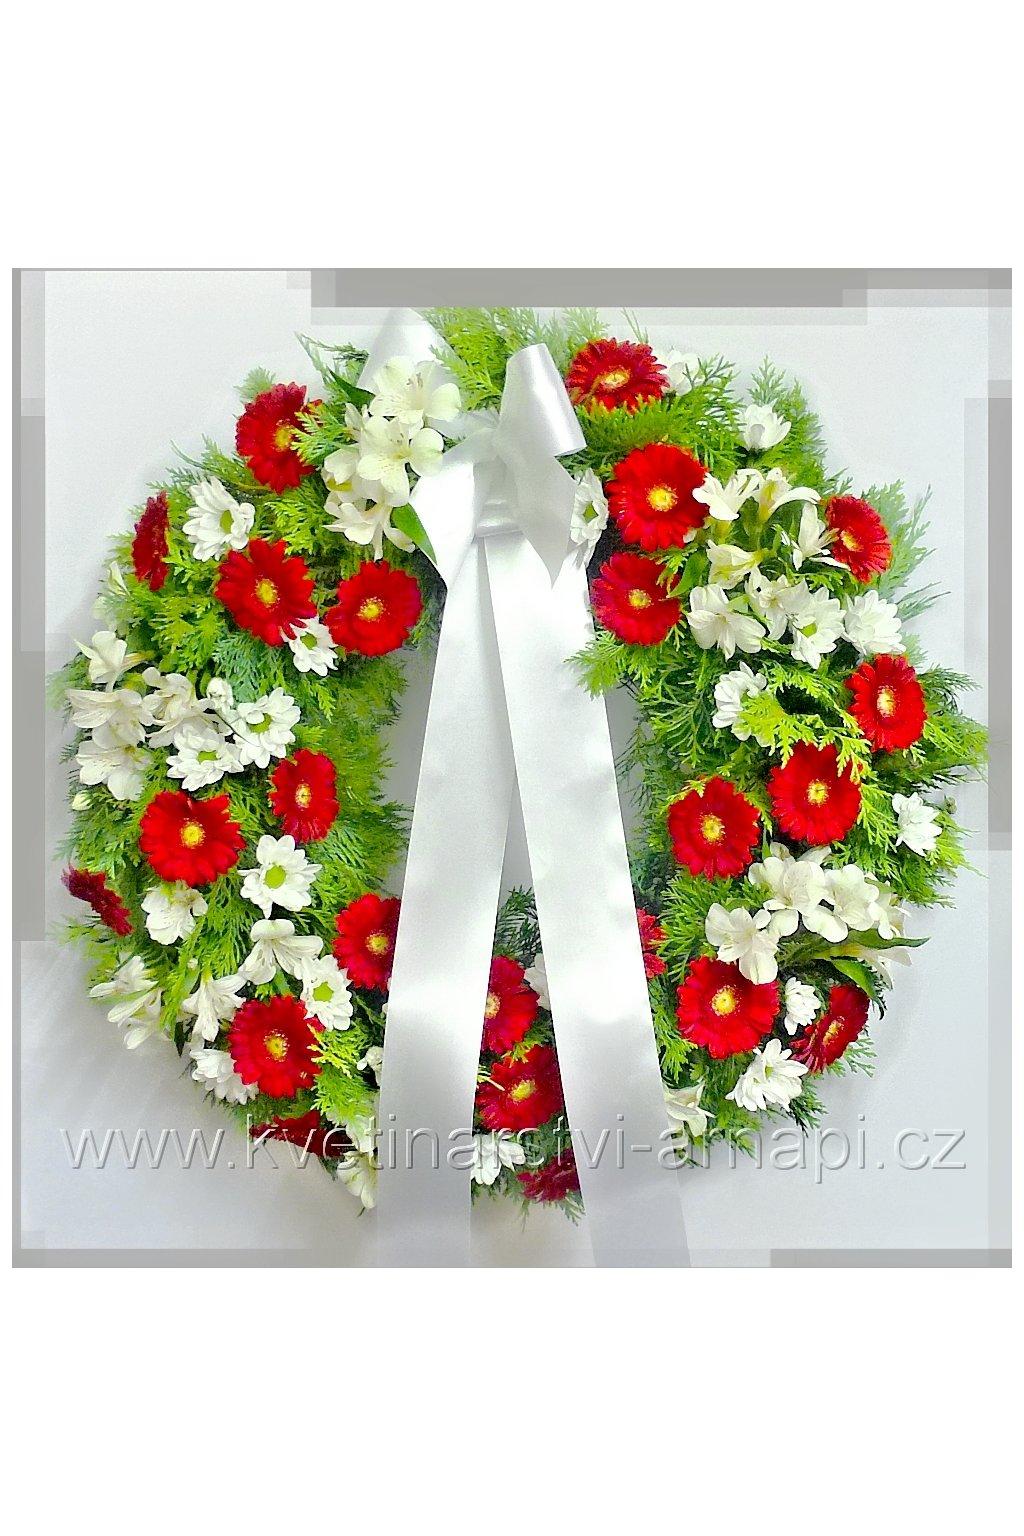 smutecni venec se stuhou rozvoz kvetinarstvi arnapi